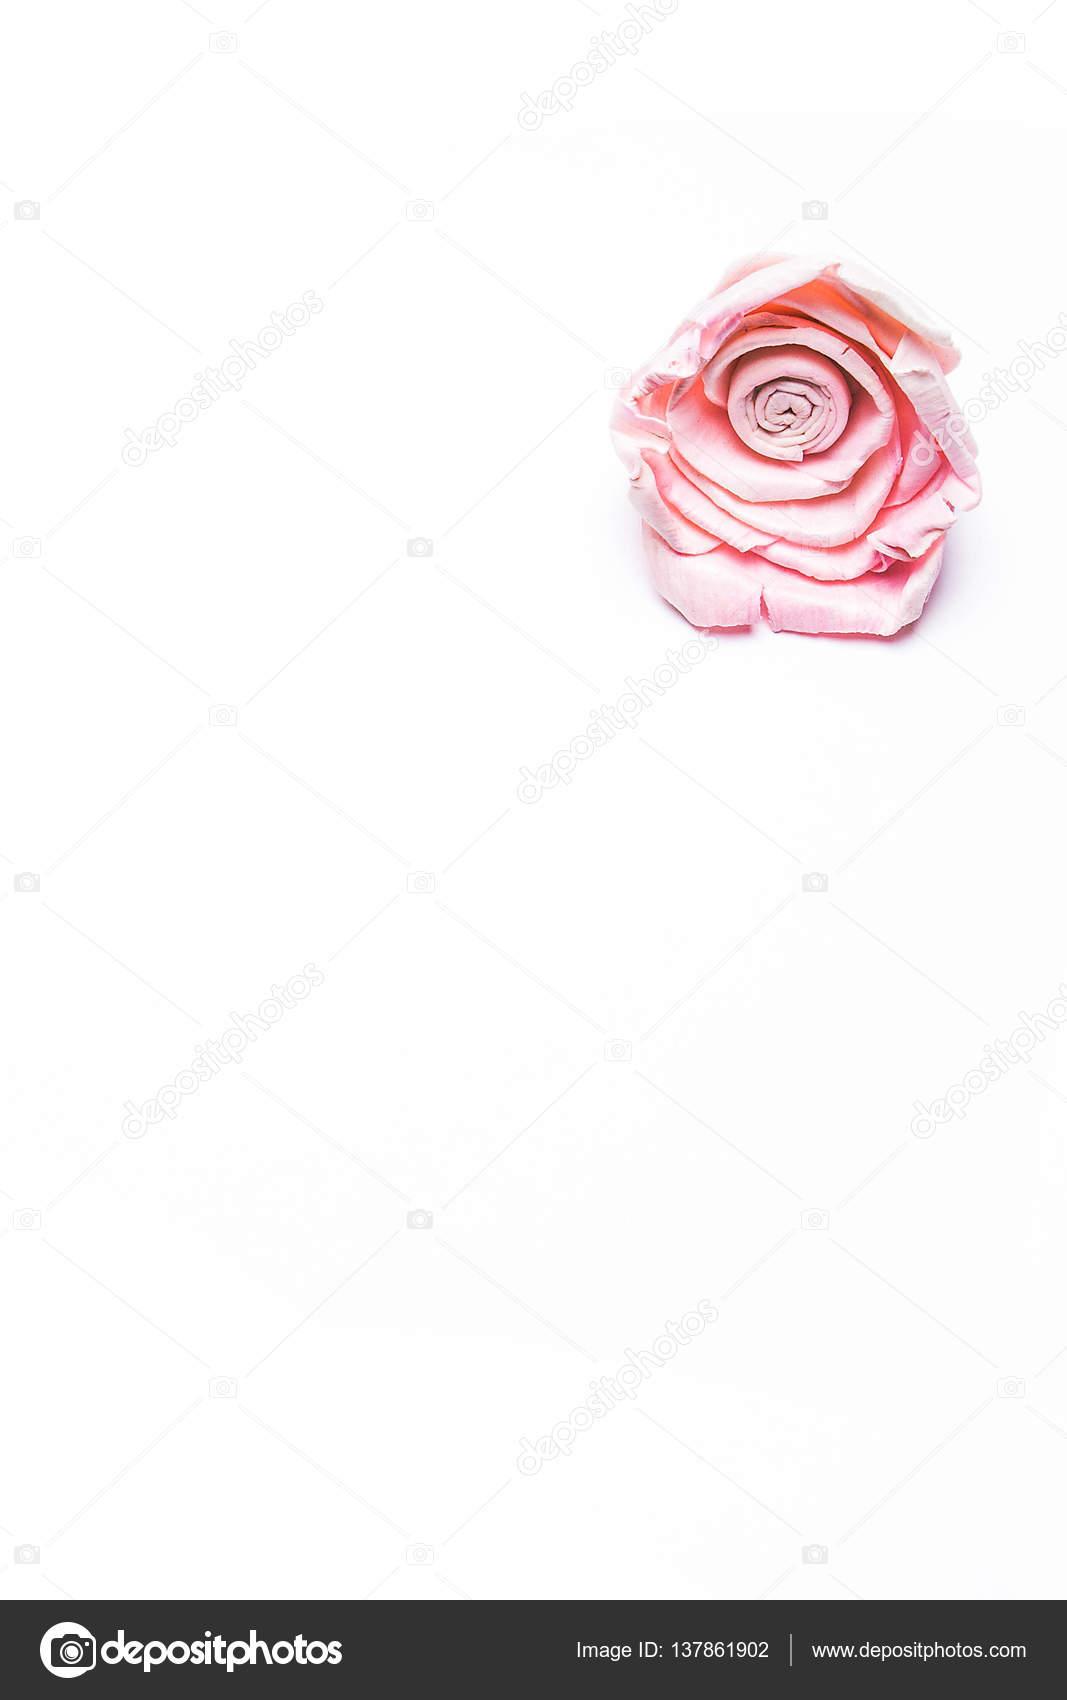 March 8 pink flowers on a white background stock photo march 8 pink flowers on a white background photo by olesyakatkovast mightylinksfo